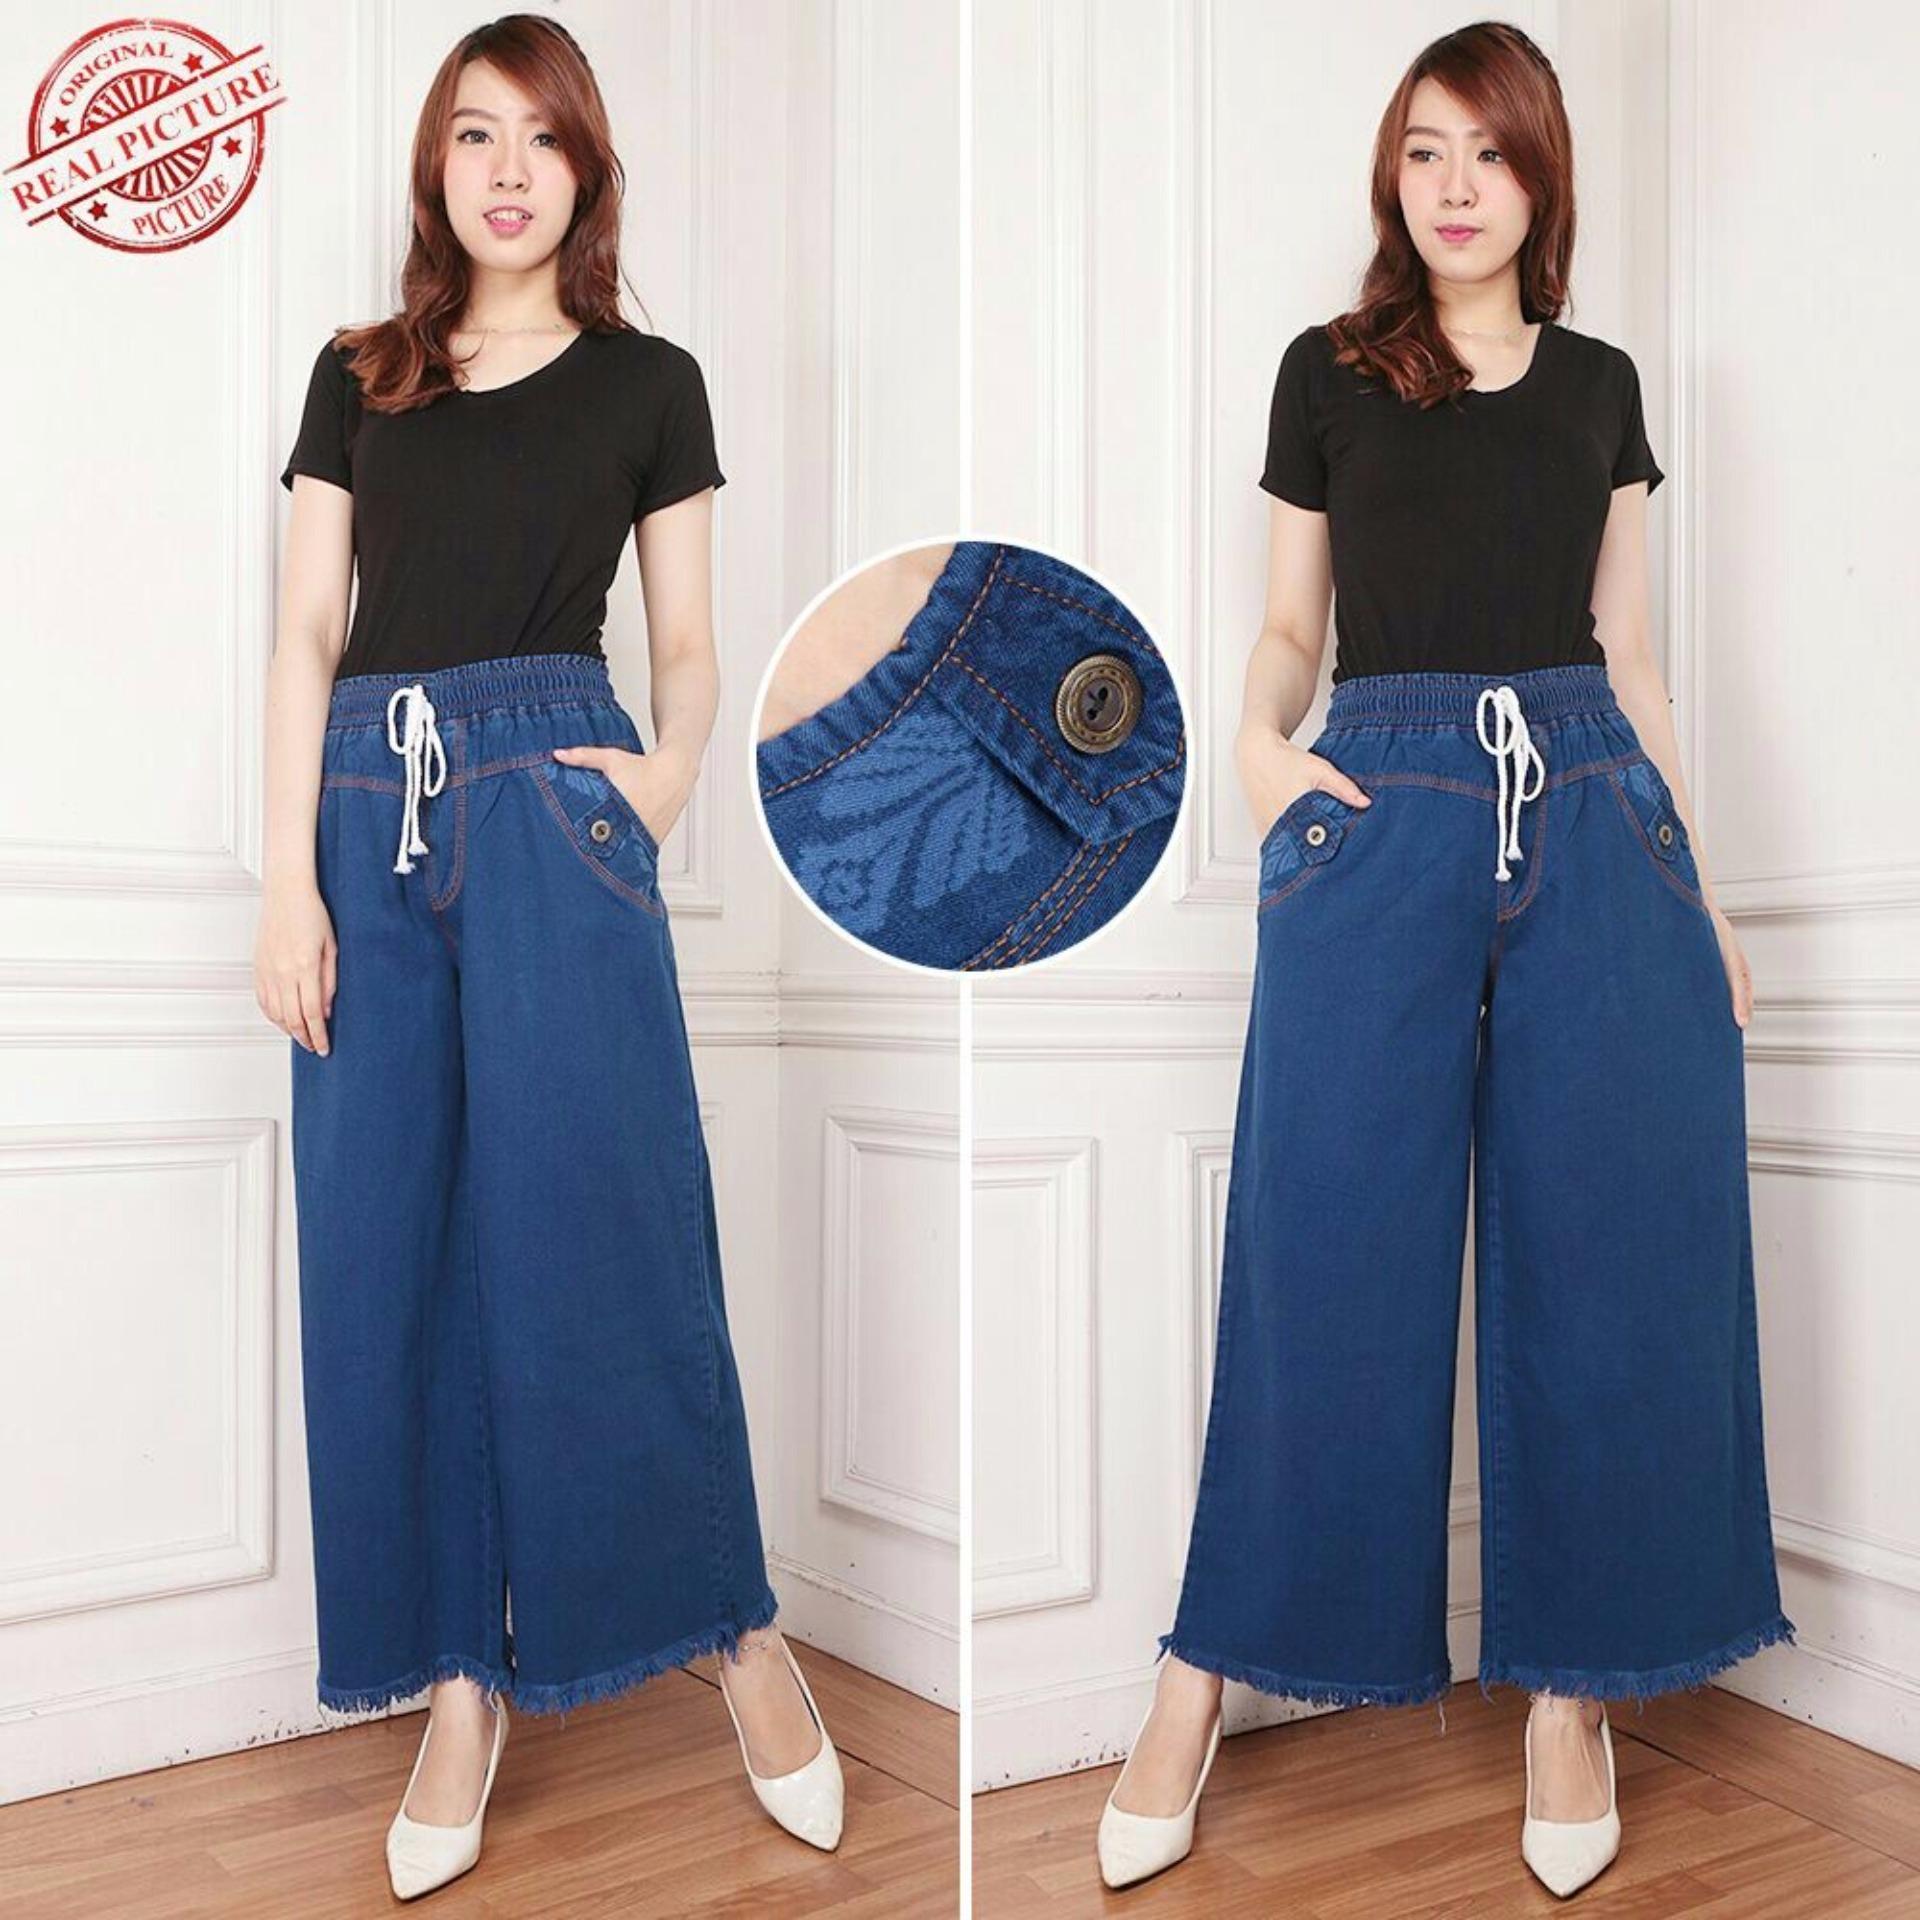 Harga Celana Jeans Kulot Panjang Wanita Jumbo Long Pant Cenny Lengkap